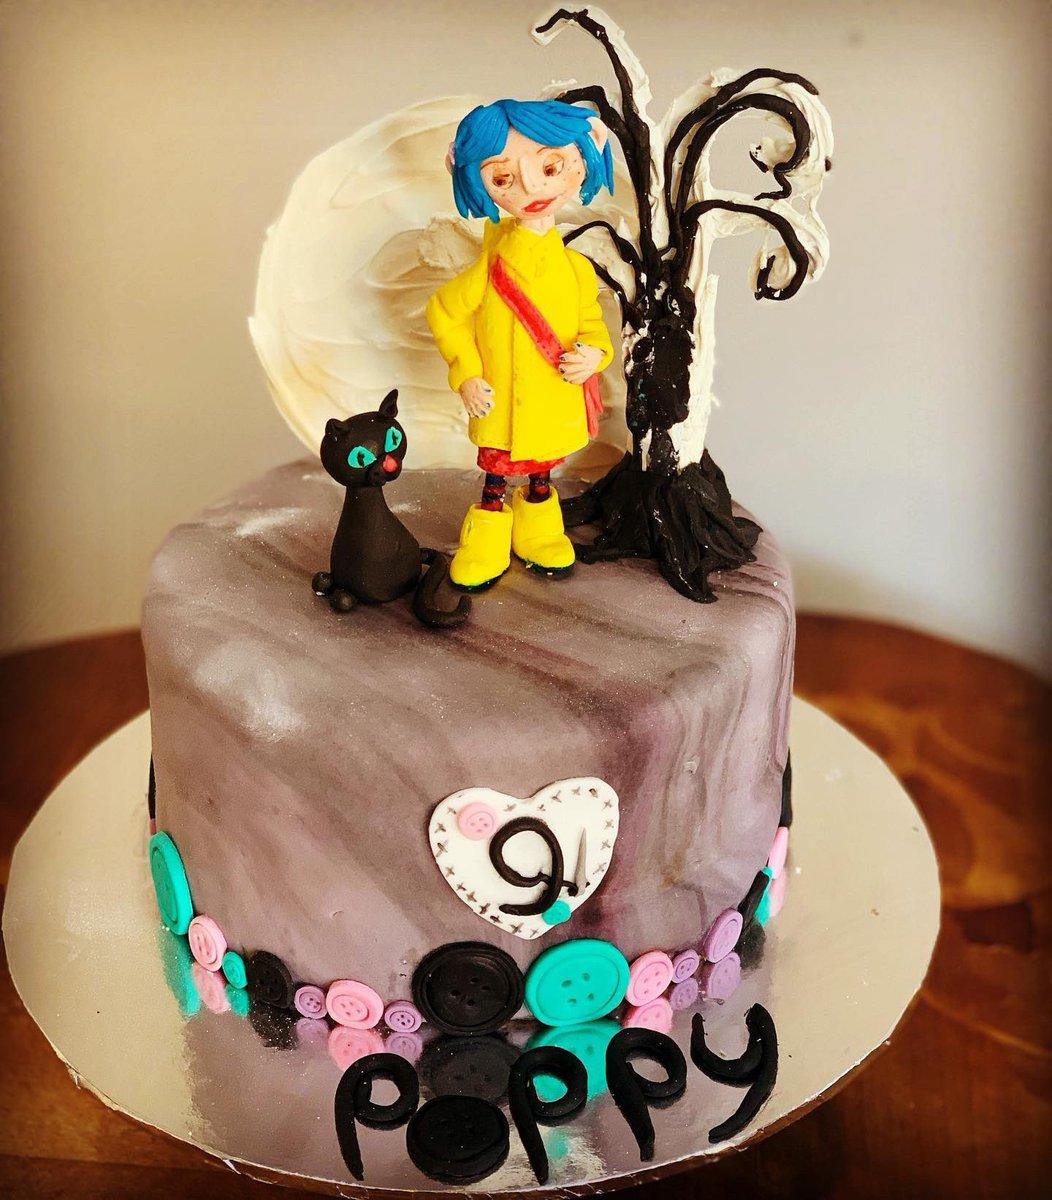 Outstanding Coralinecake Hashtag On Twitter Funny Birthday Cards Online Inifodamsfinfo